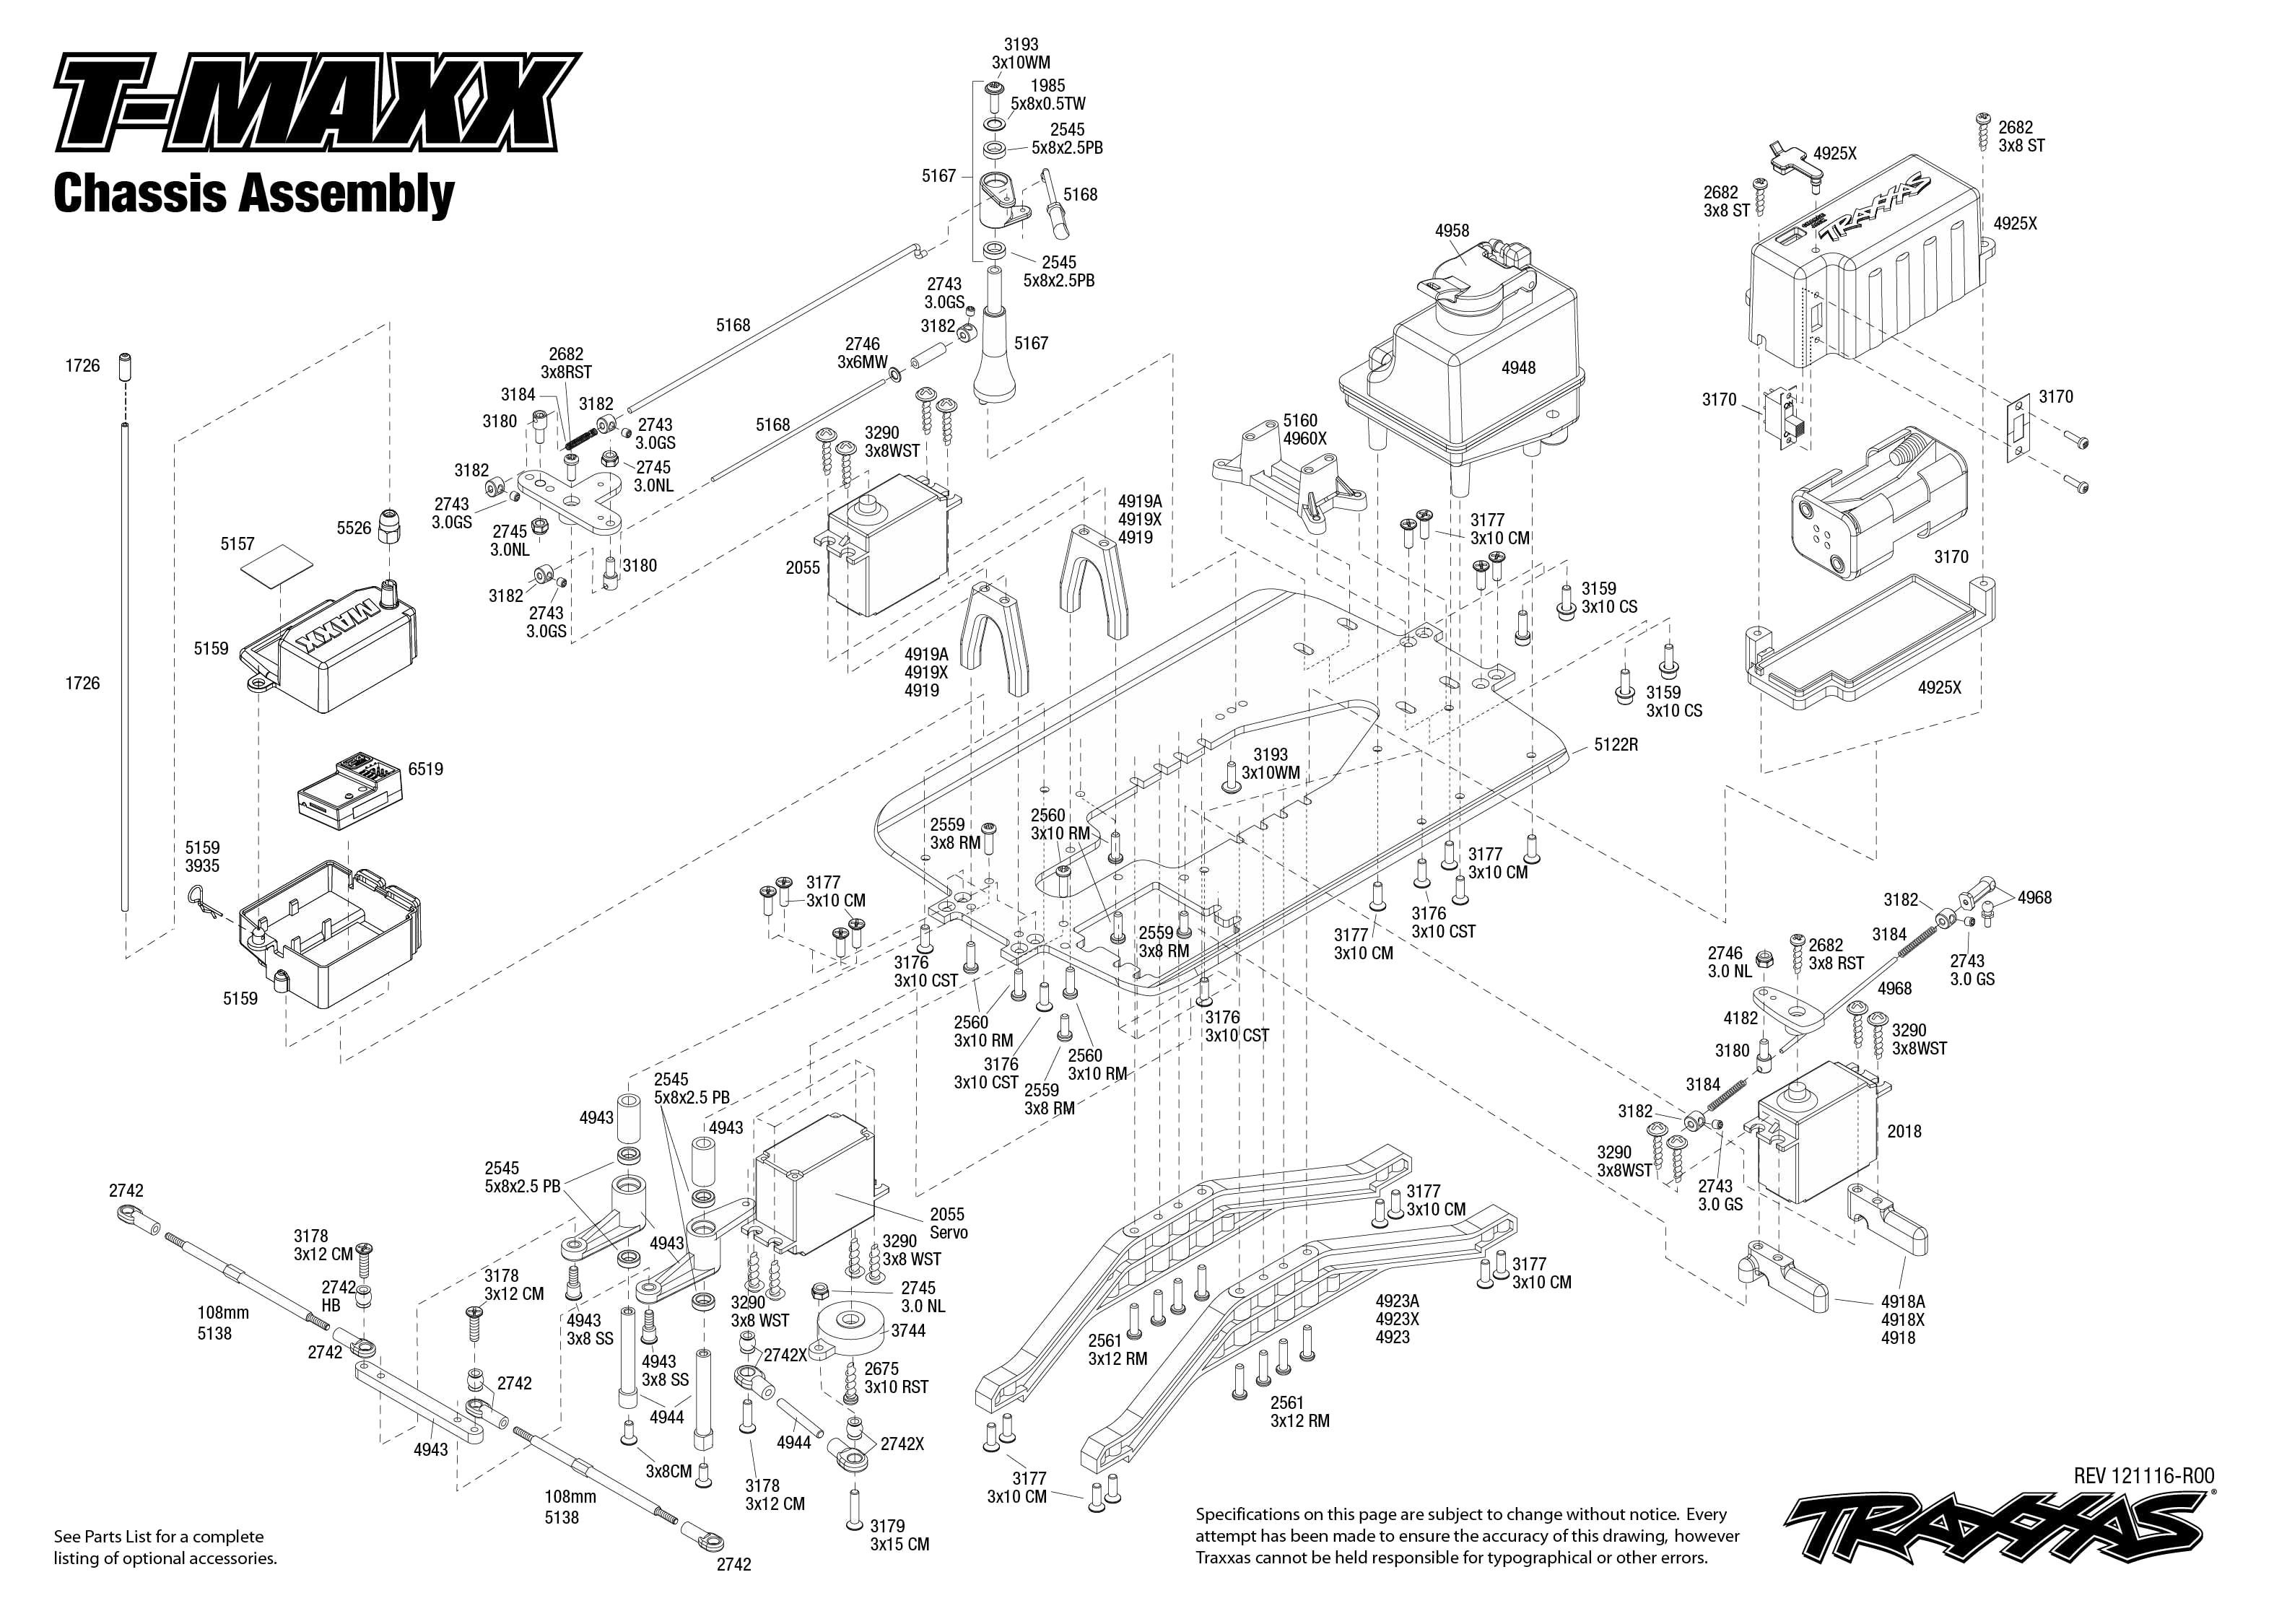 Astonishing Nitro Traxxas Receiver Wiring Diagram Gallery - Best ...